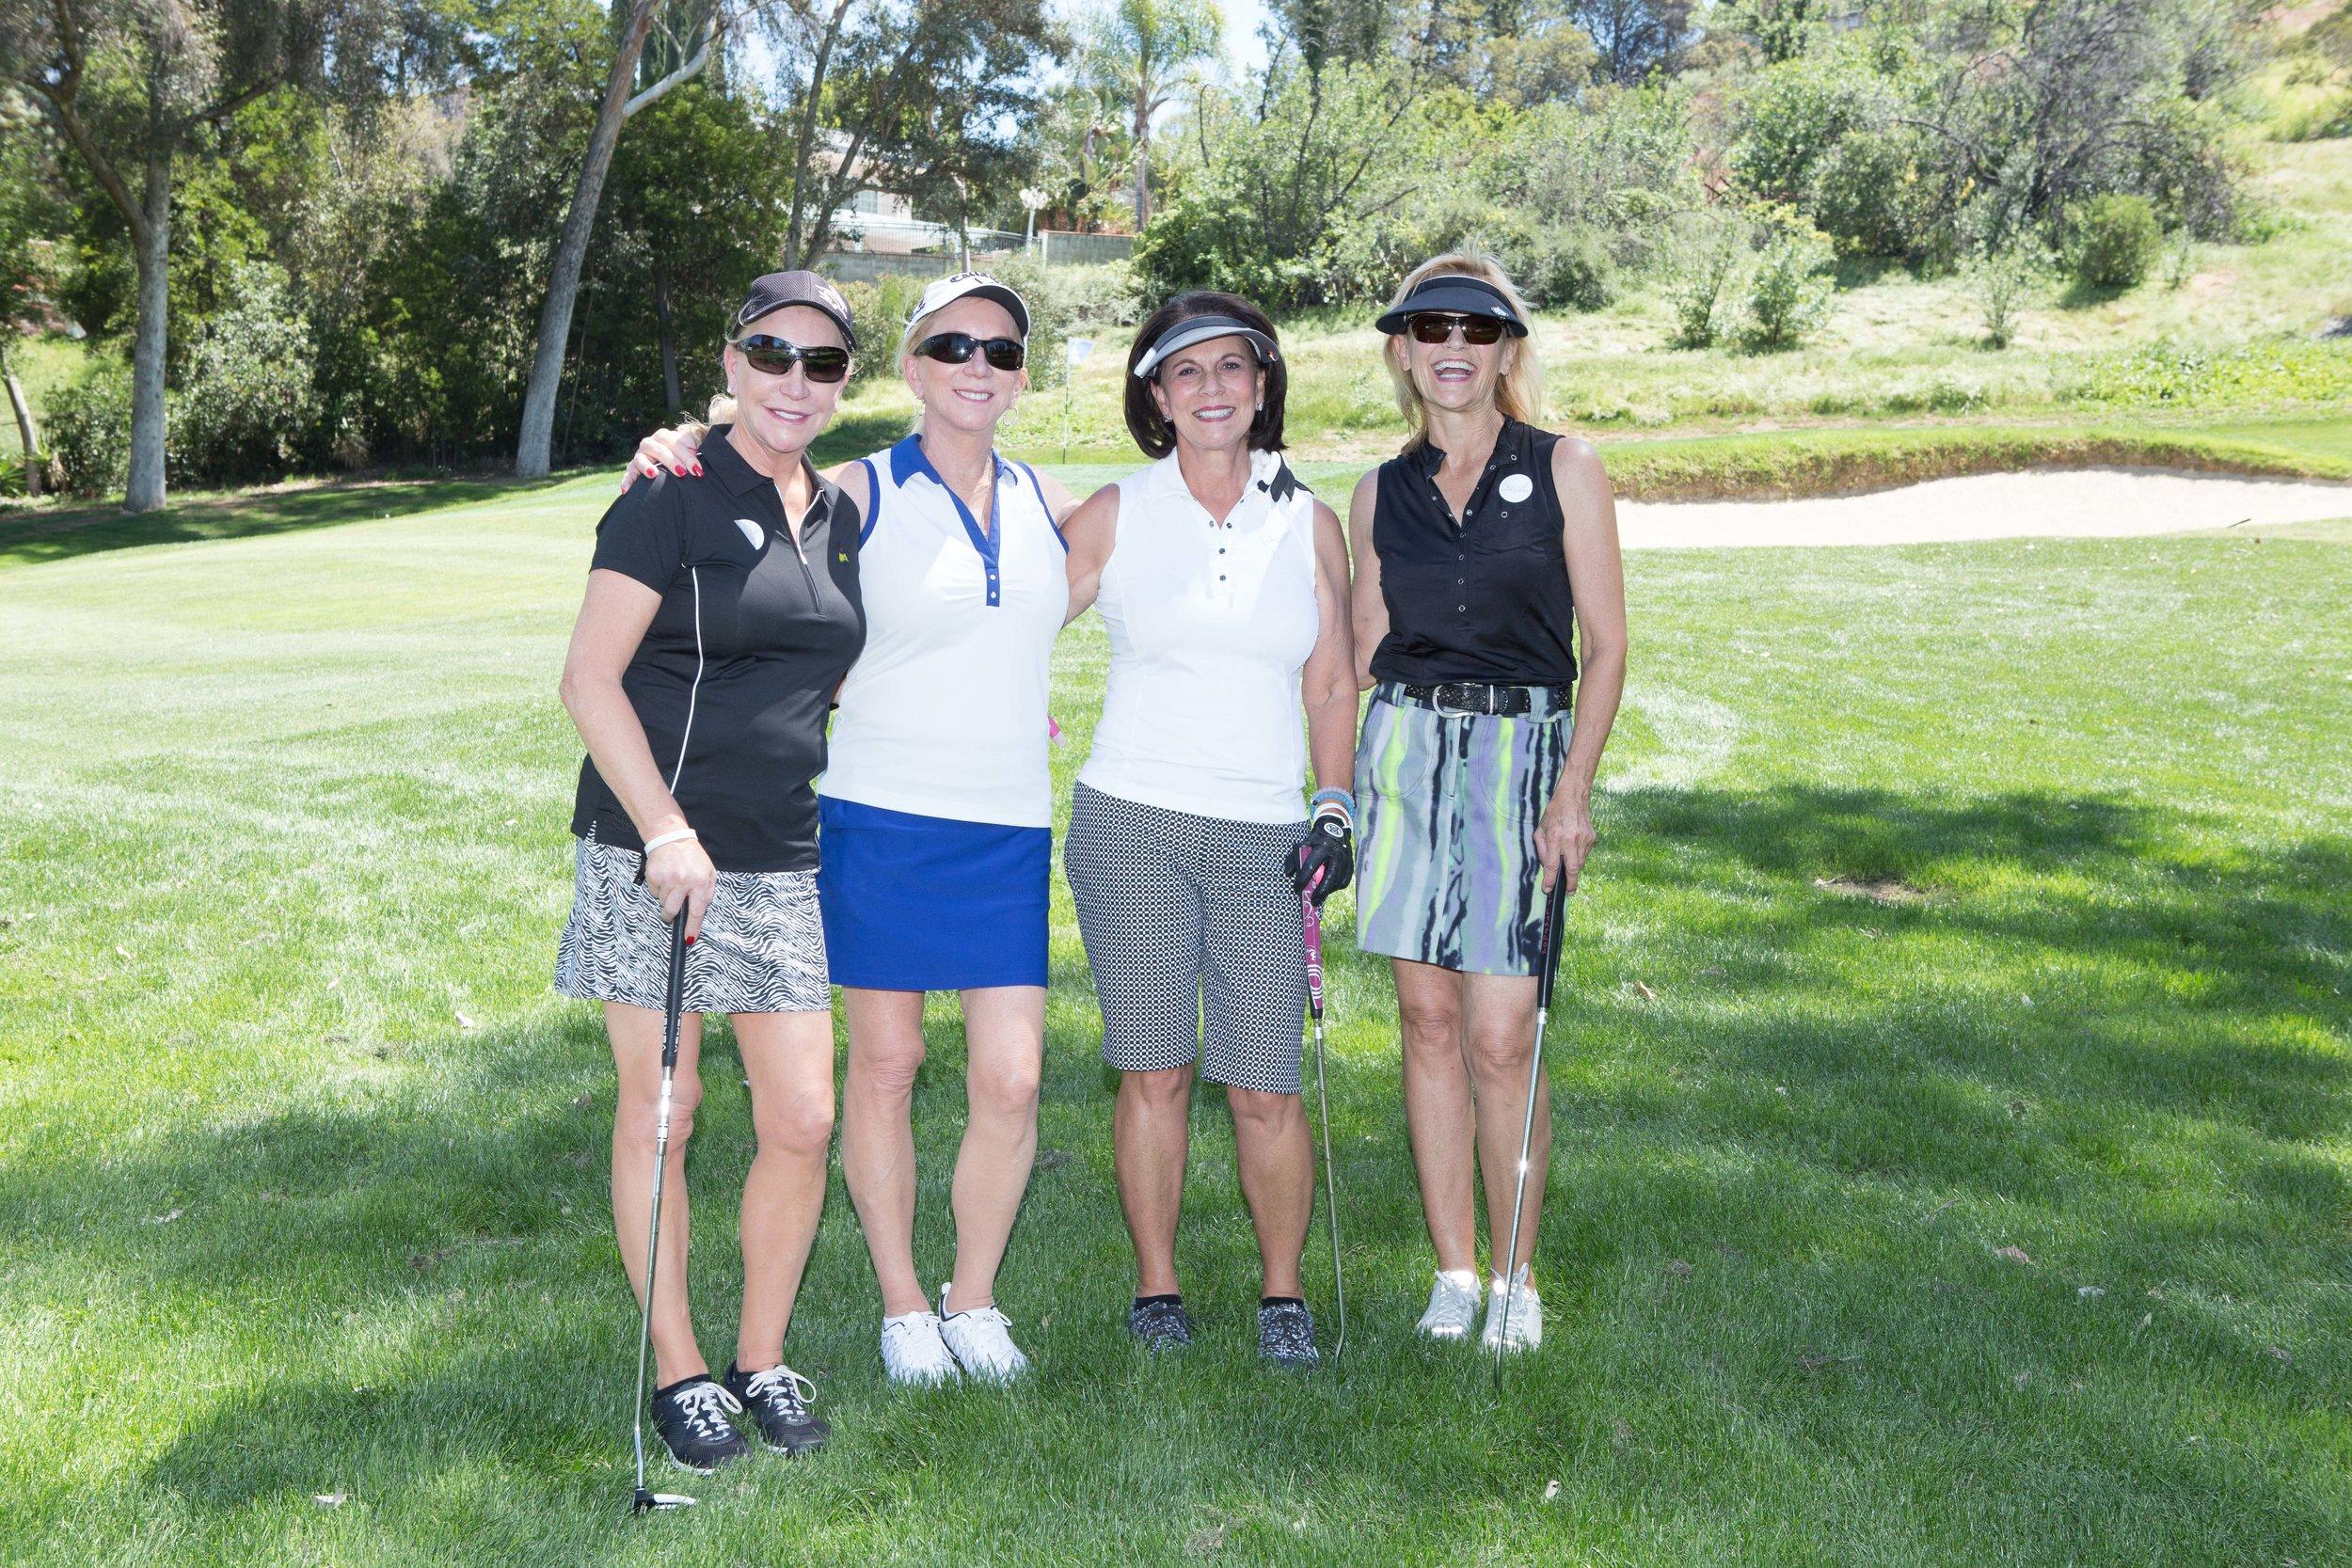 IMG_7984-lady golfers.jpg